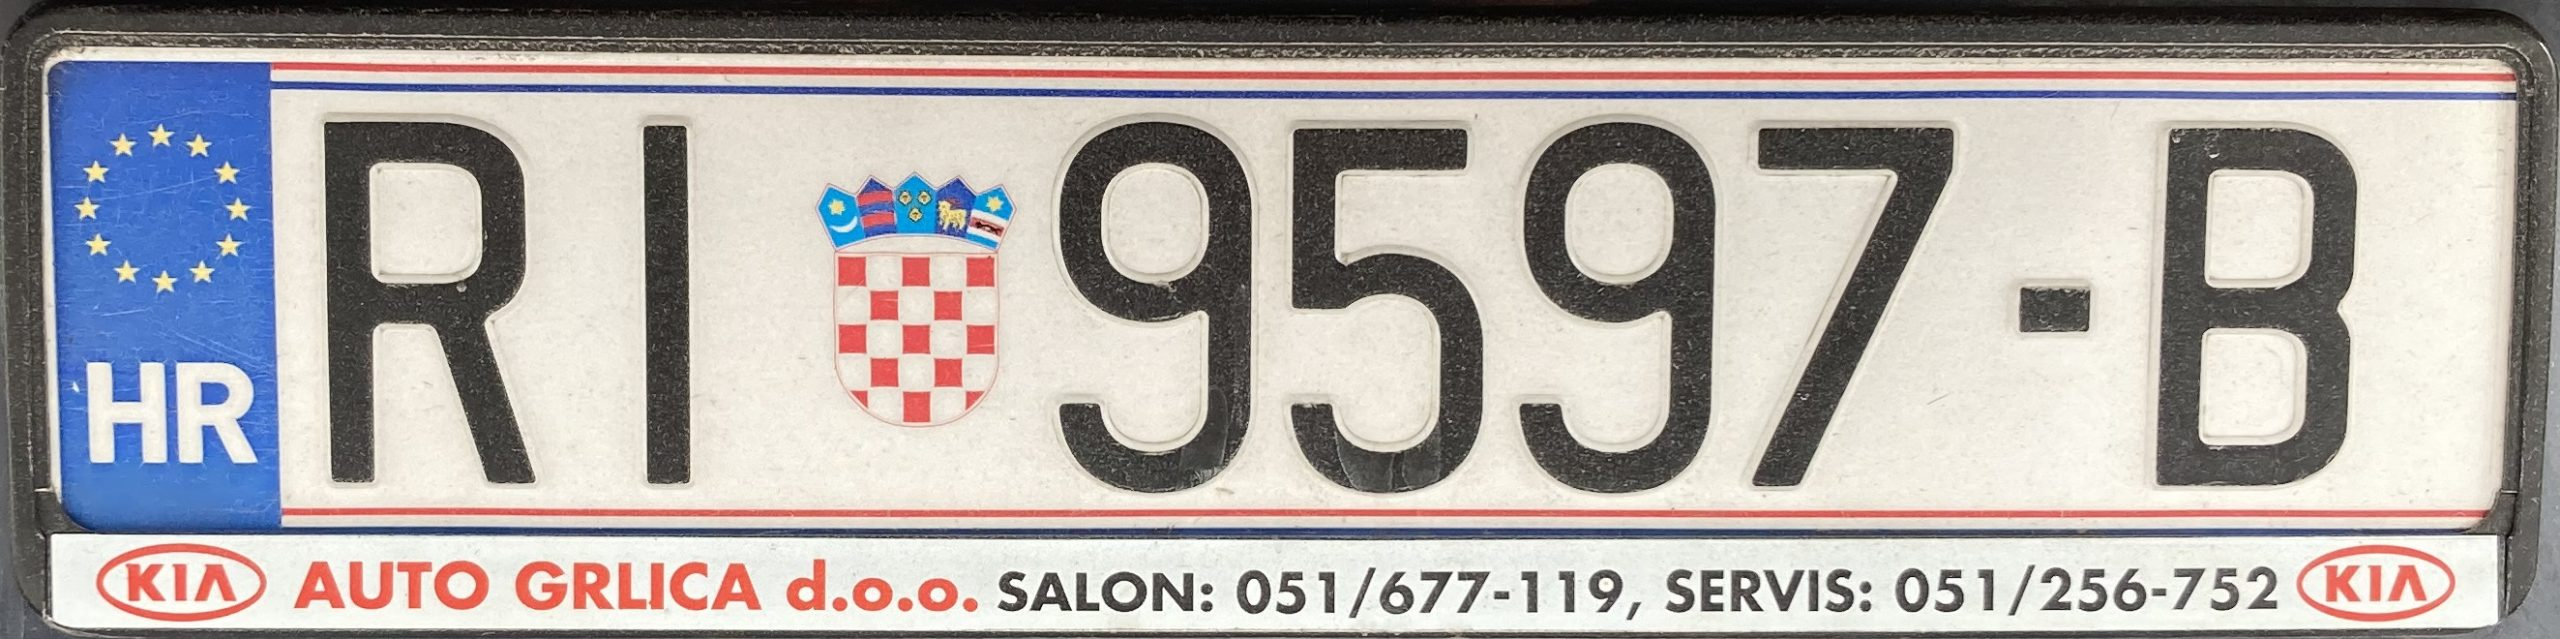 Registrační značka Chorvatsko - RI - Rijeka, foto: www.podalnici.cz